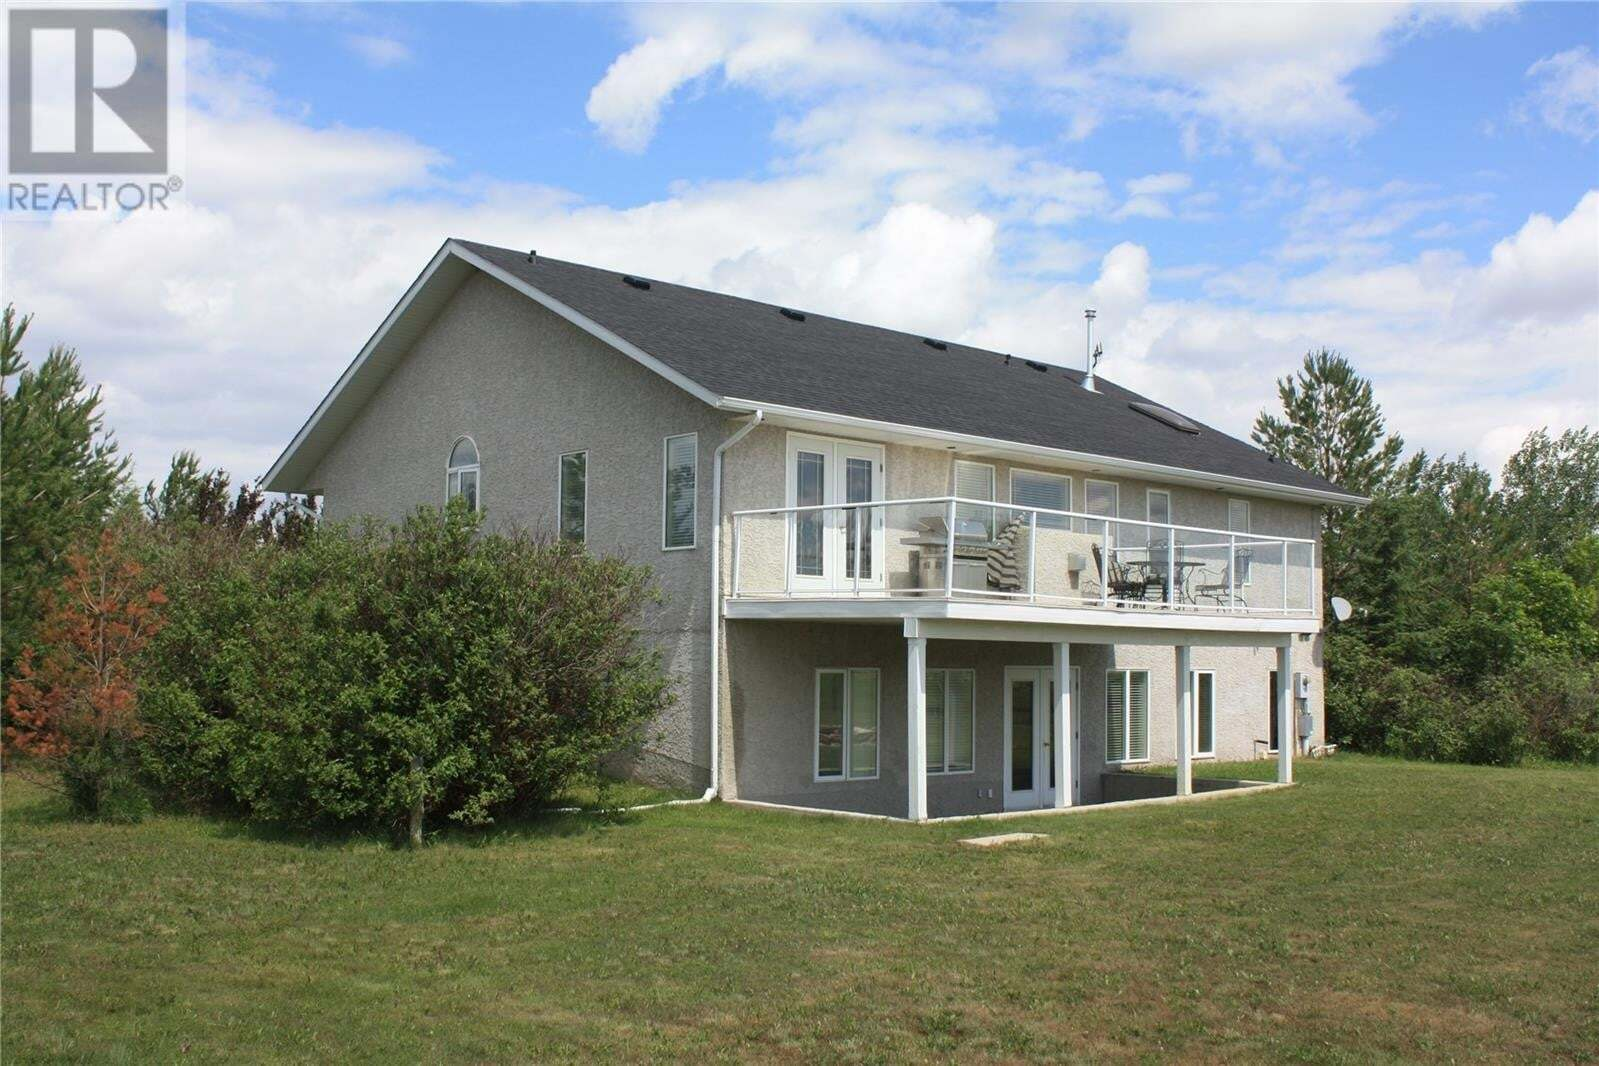 House for sale at 58 South Point Ln Corman Park Rm No. 344 Saskatchewan - MLS: SK819256